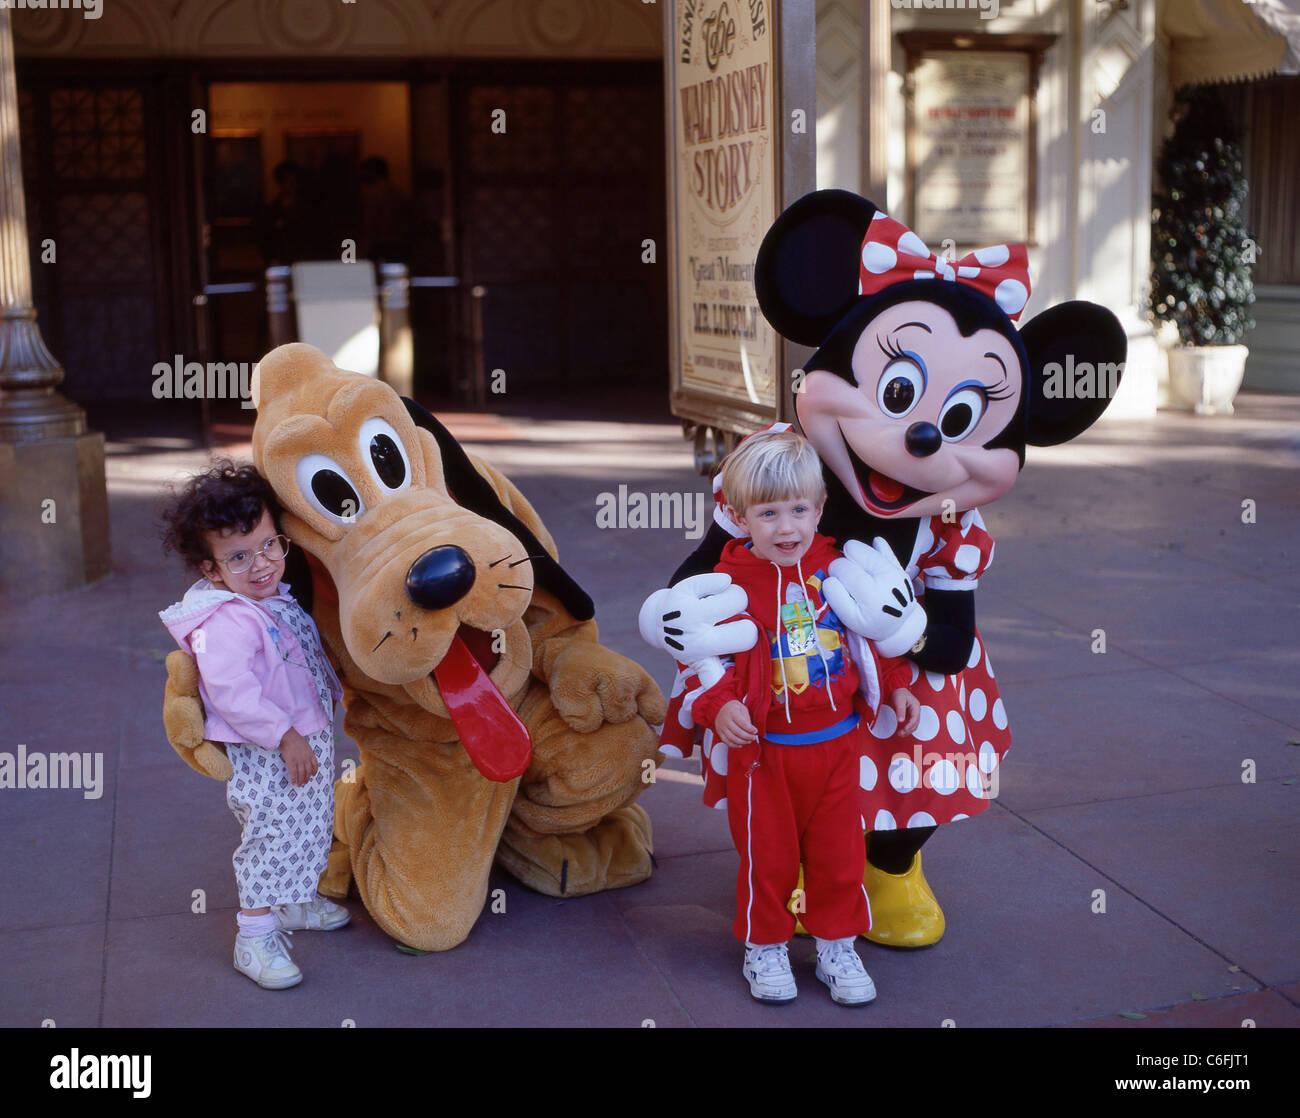 Young children with Pluto and Minnie, Fantasyland, Disneyland, Anaheim, California, United States of America Stock Photo